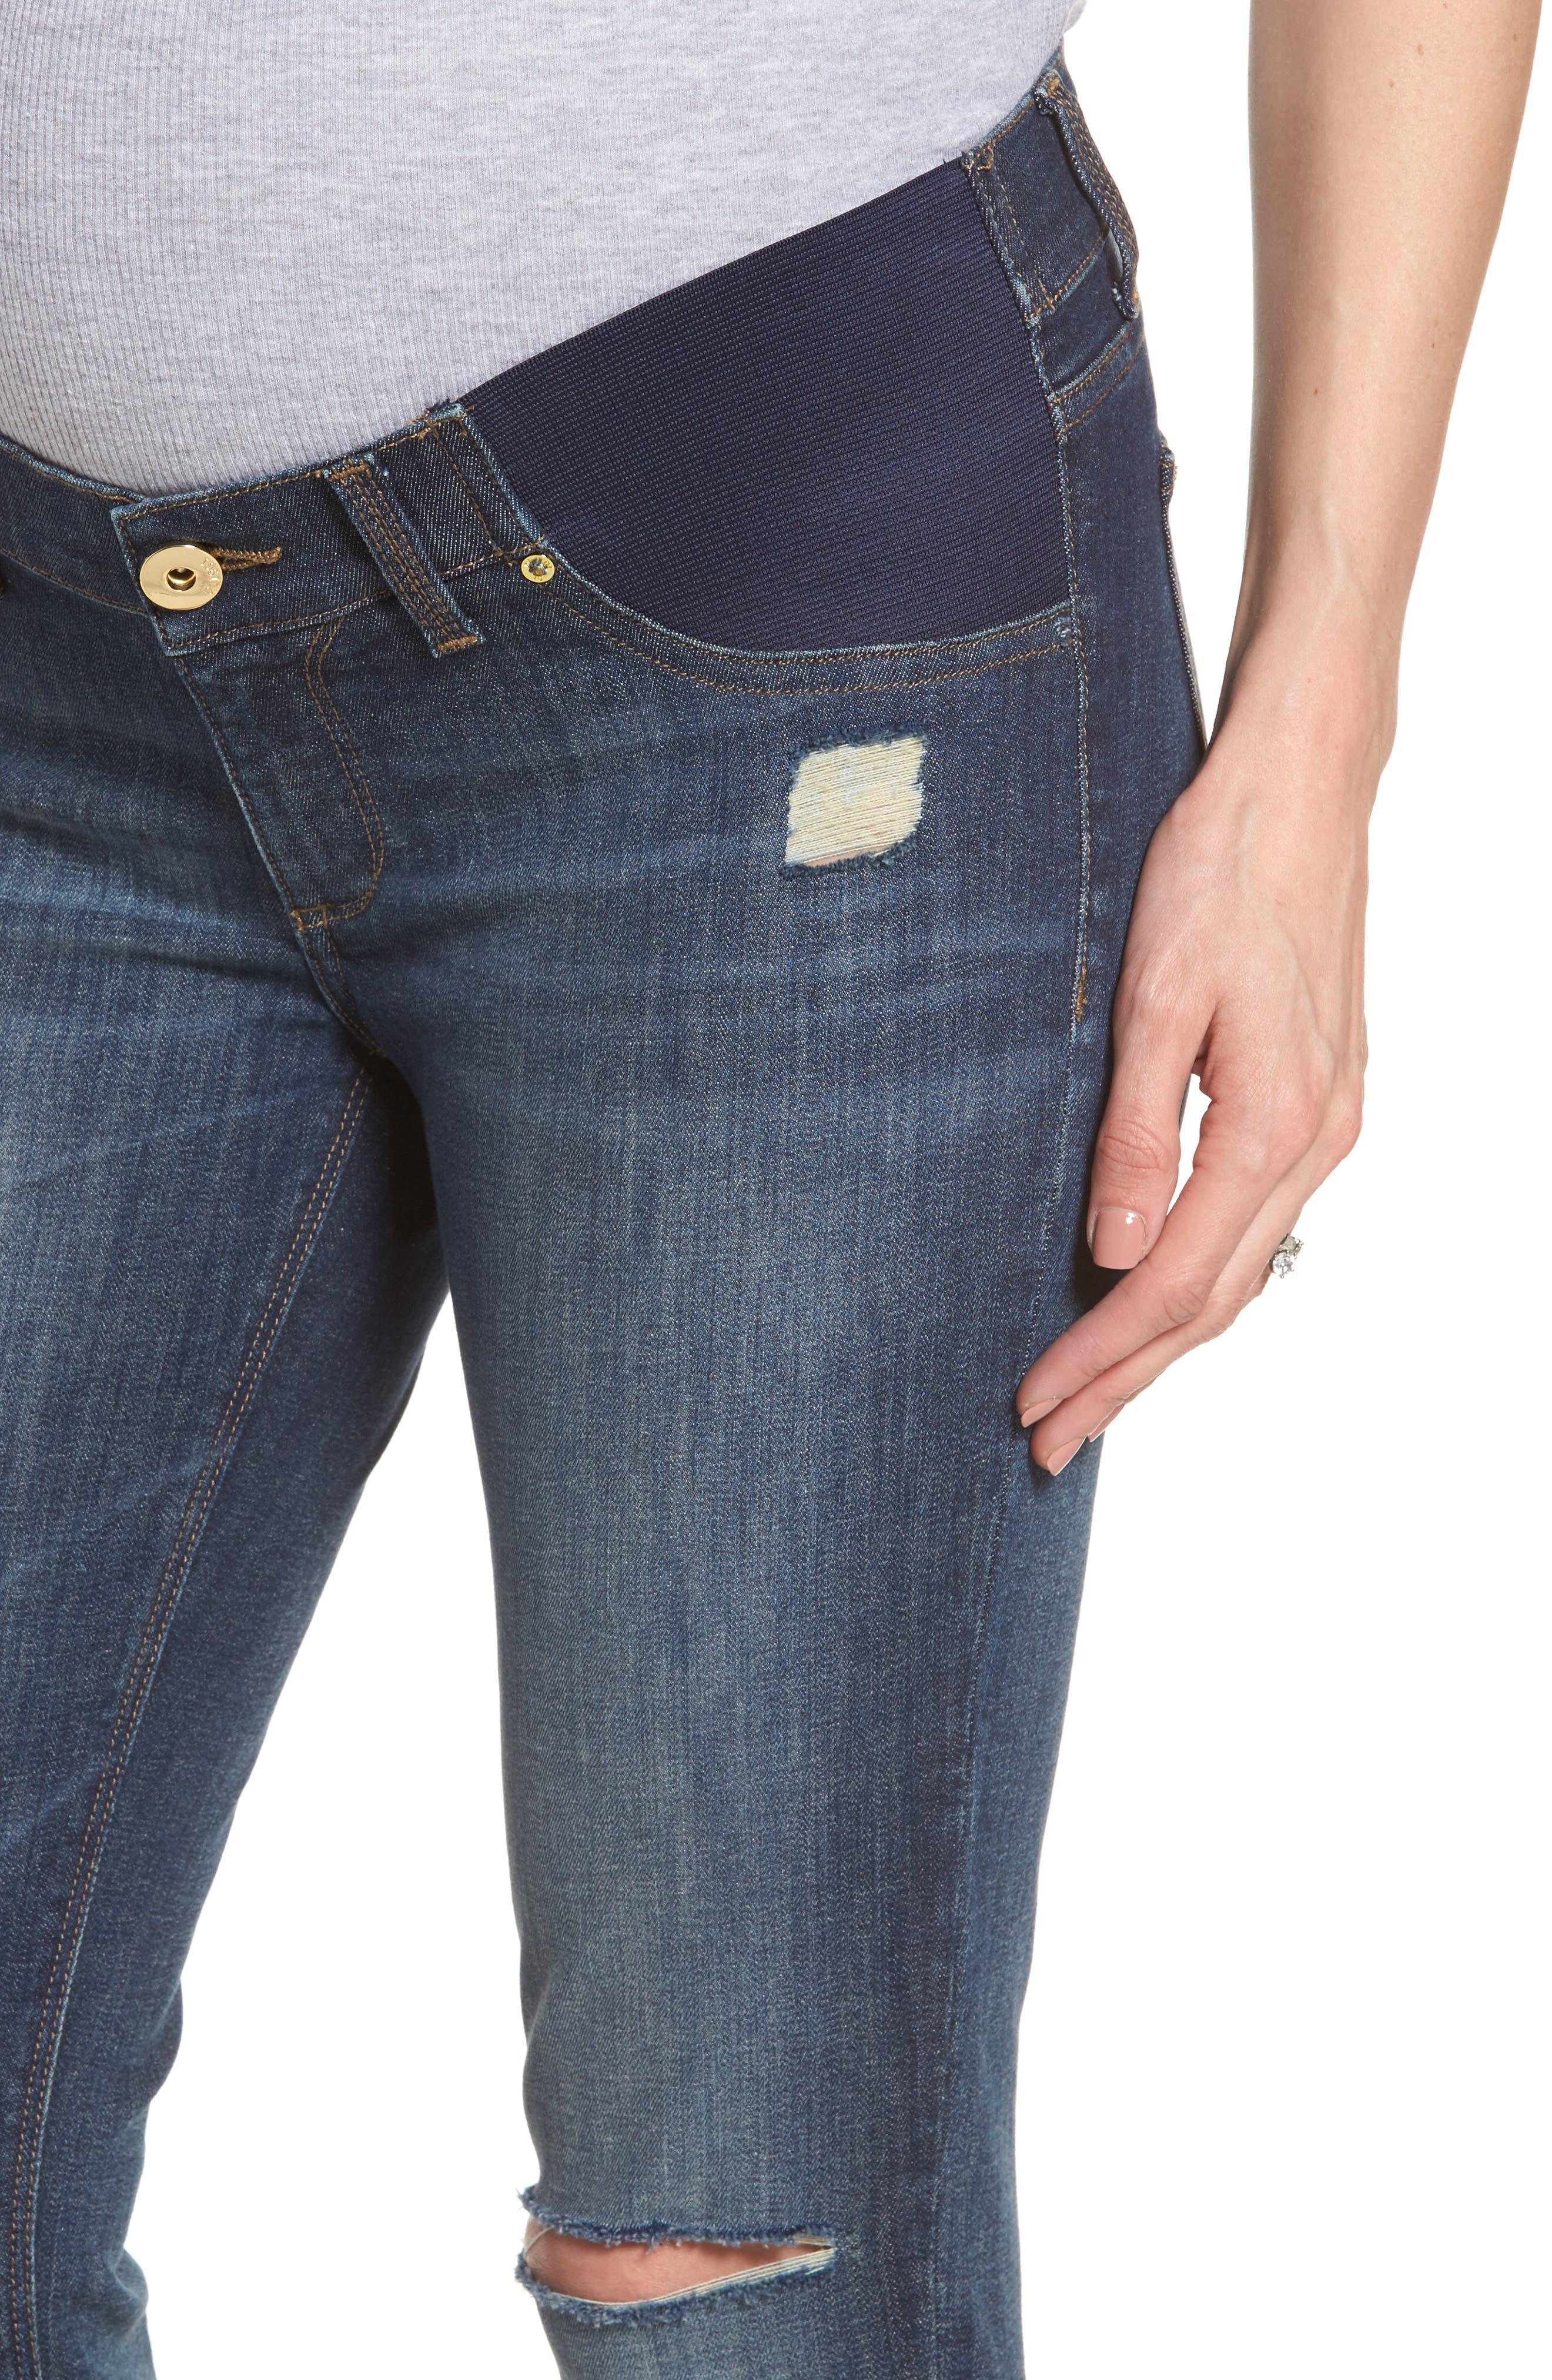 Emma Power Legging Maternity Jeans,                             Alternate thumbnail 4, color,                             405